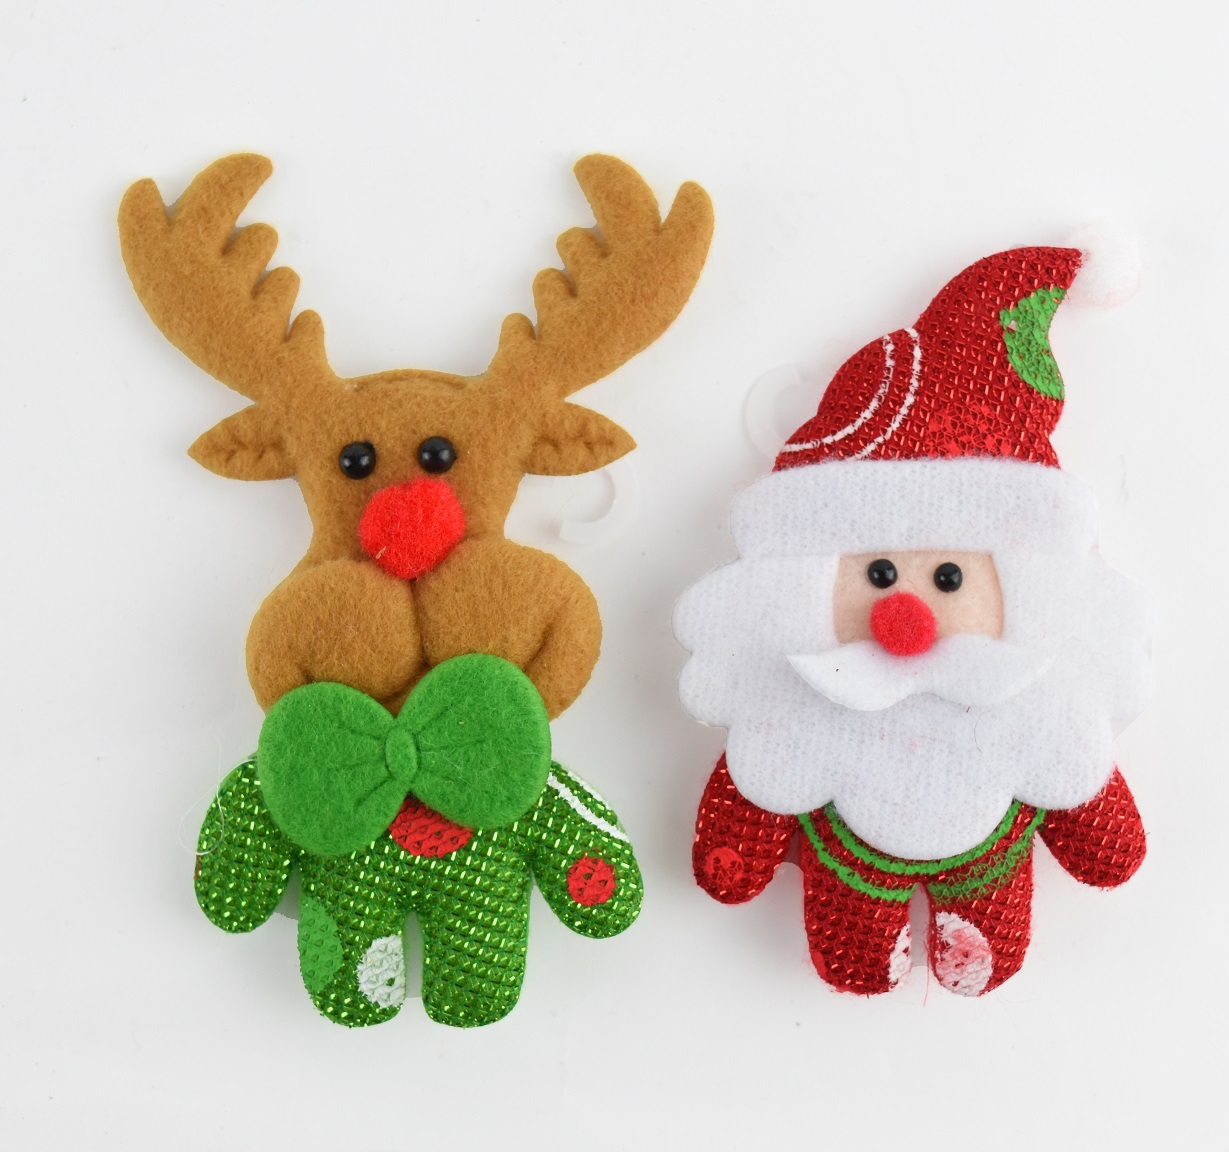 X射線【X457012】兩用公仔胸針吊飾(2入1組),聖誕節/交換禮物/掛飾/裝飾/吊飾/聖誕襪/禮物袋/糖果袋